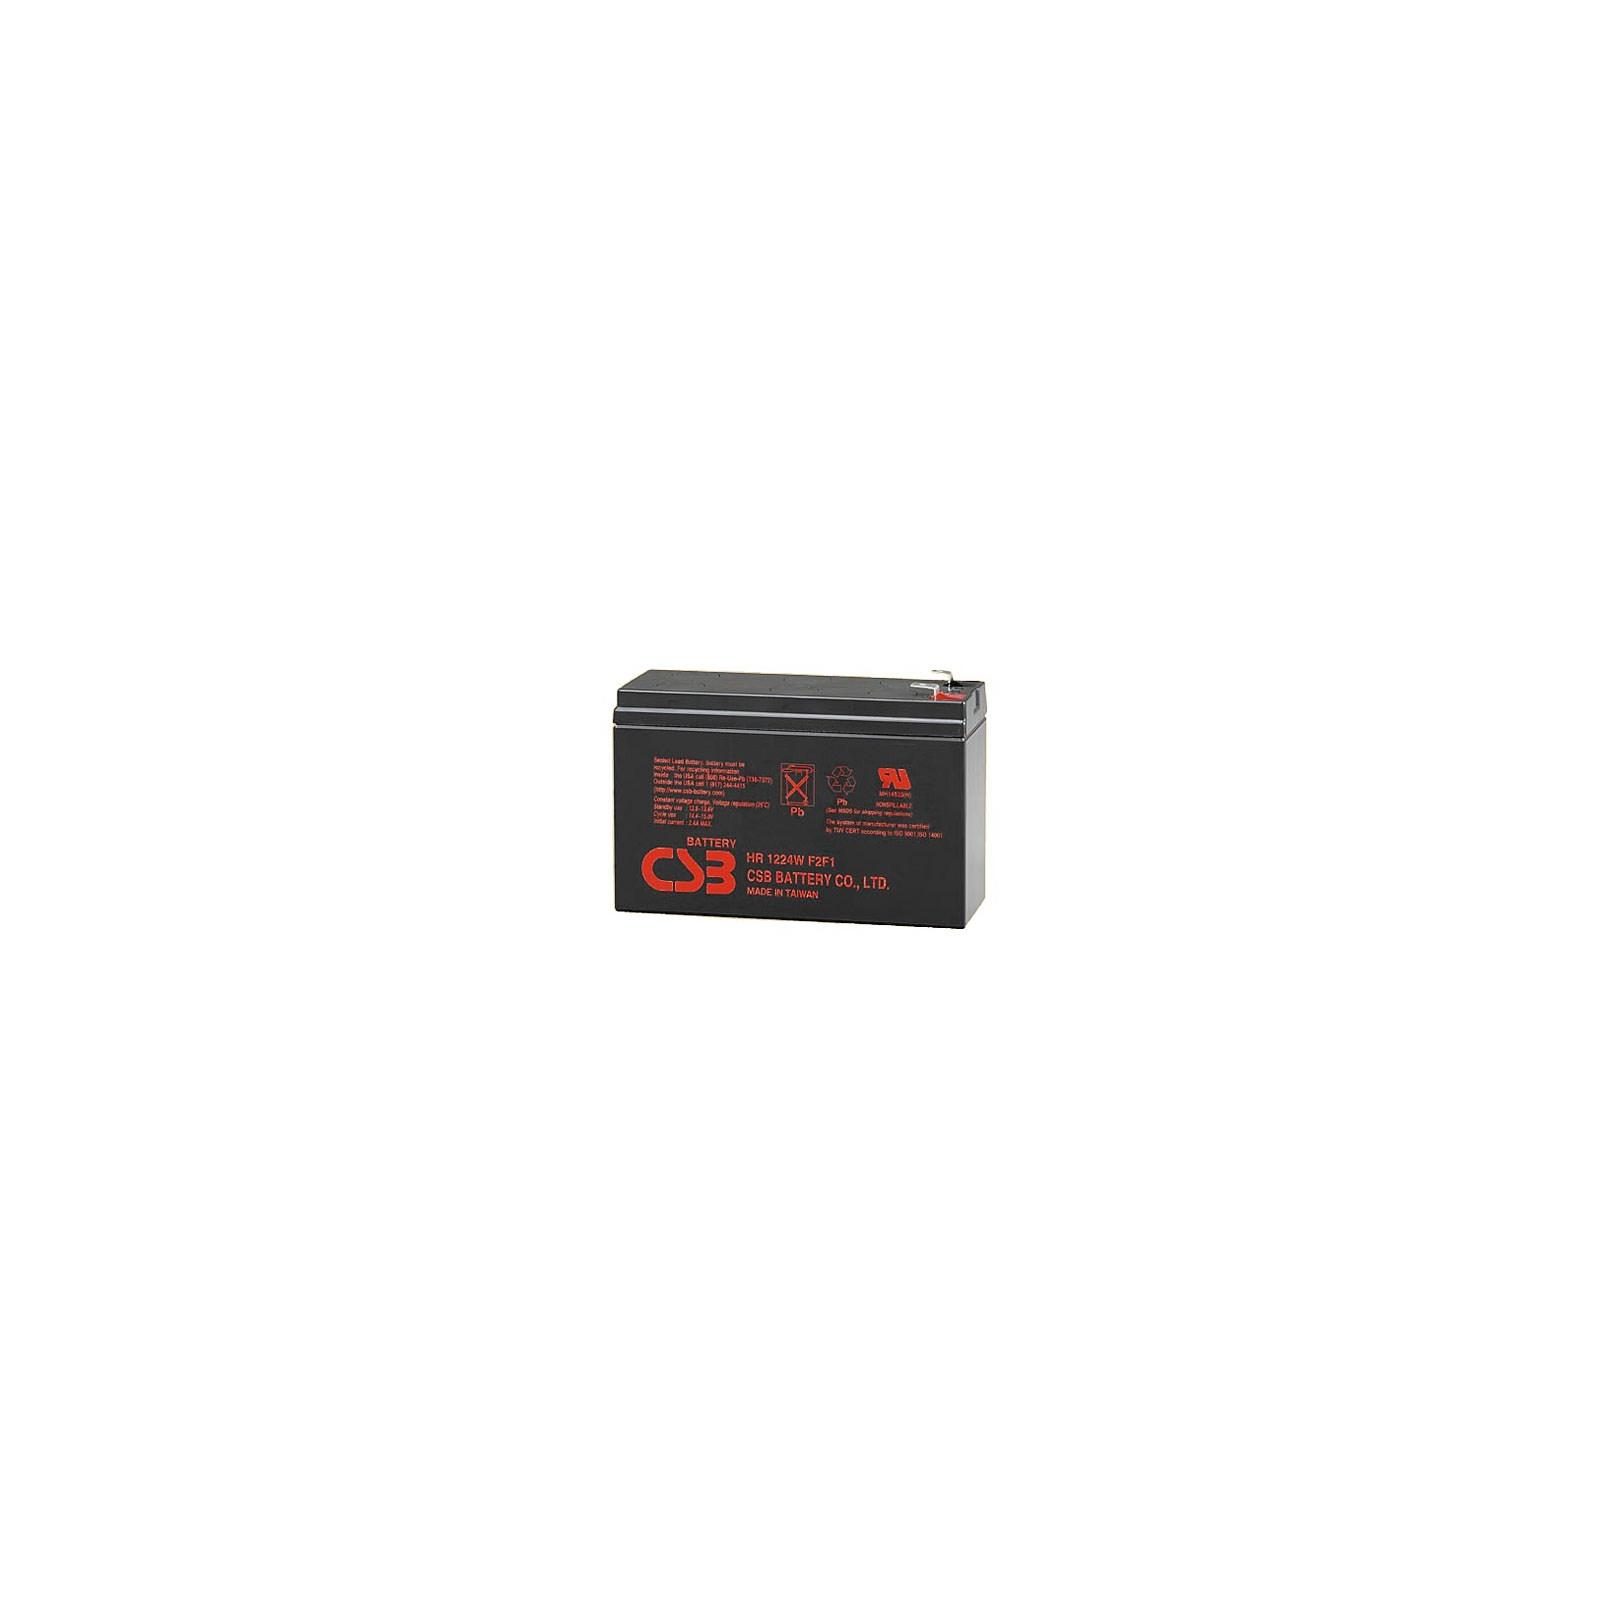 Батарея к ИБП 12В 6.5Ач CSB (HR1224WF2F1)